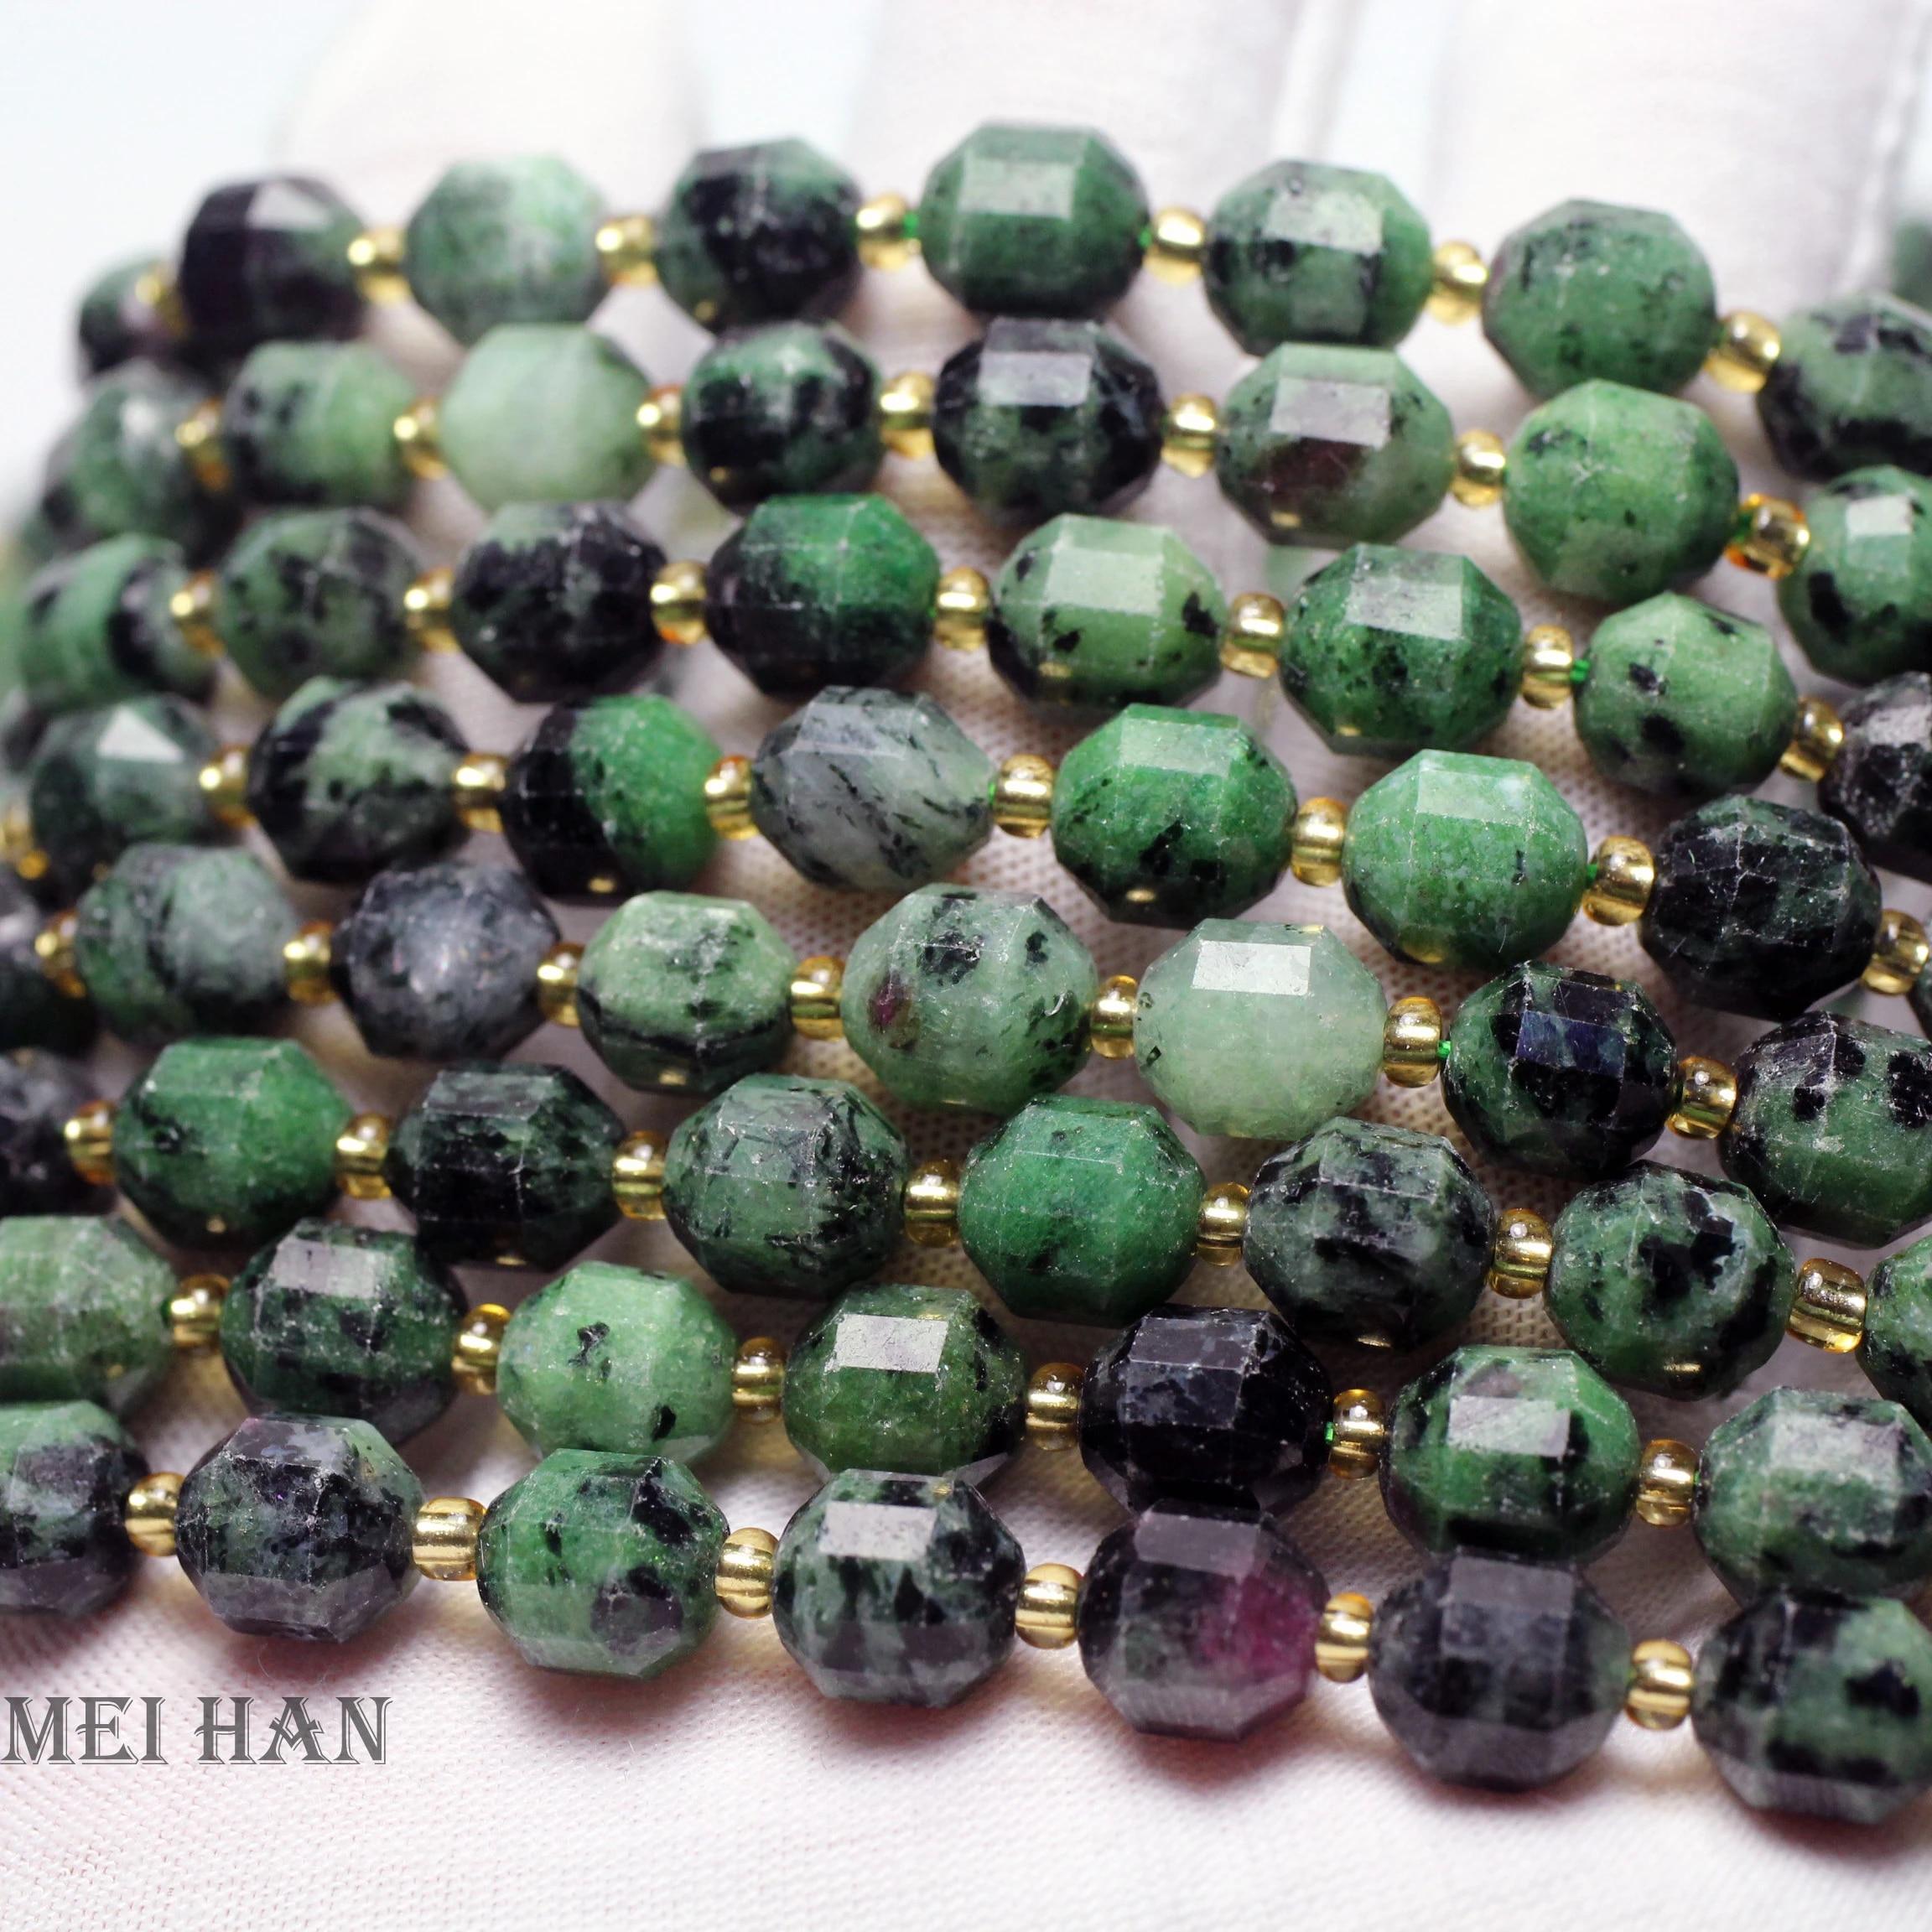 Seraphinite 8/'/' Africa Faceted Almond 1 Strand Gemstone EB0356 Jewelry Beads   Handmade  Natural